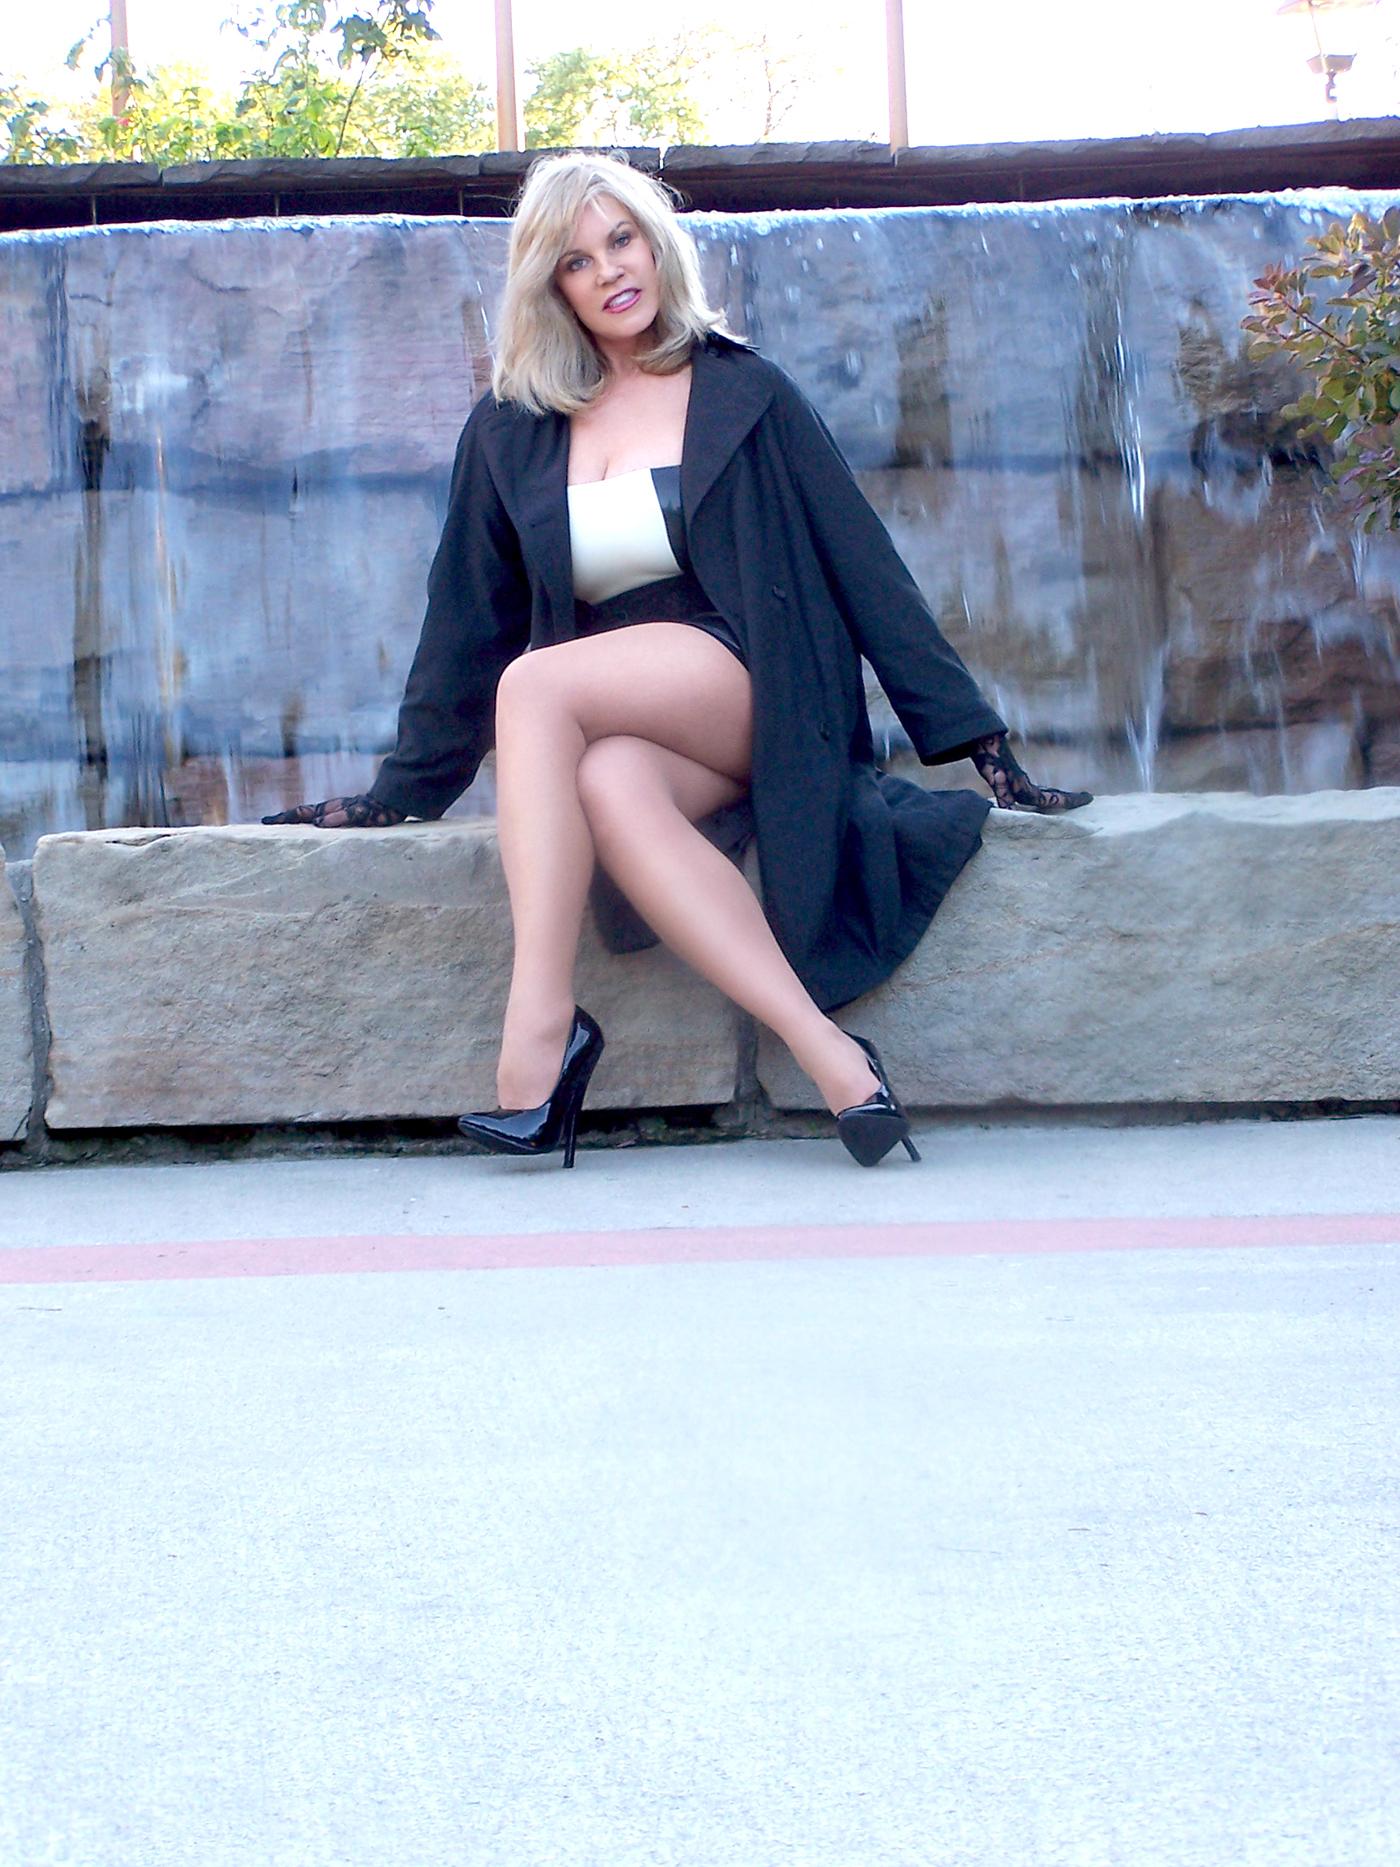 latex & stilettos on behance